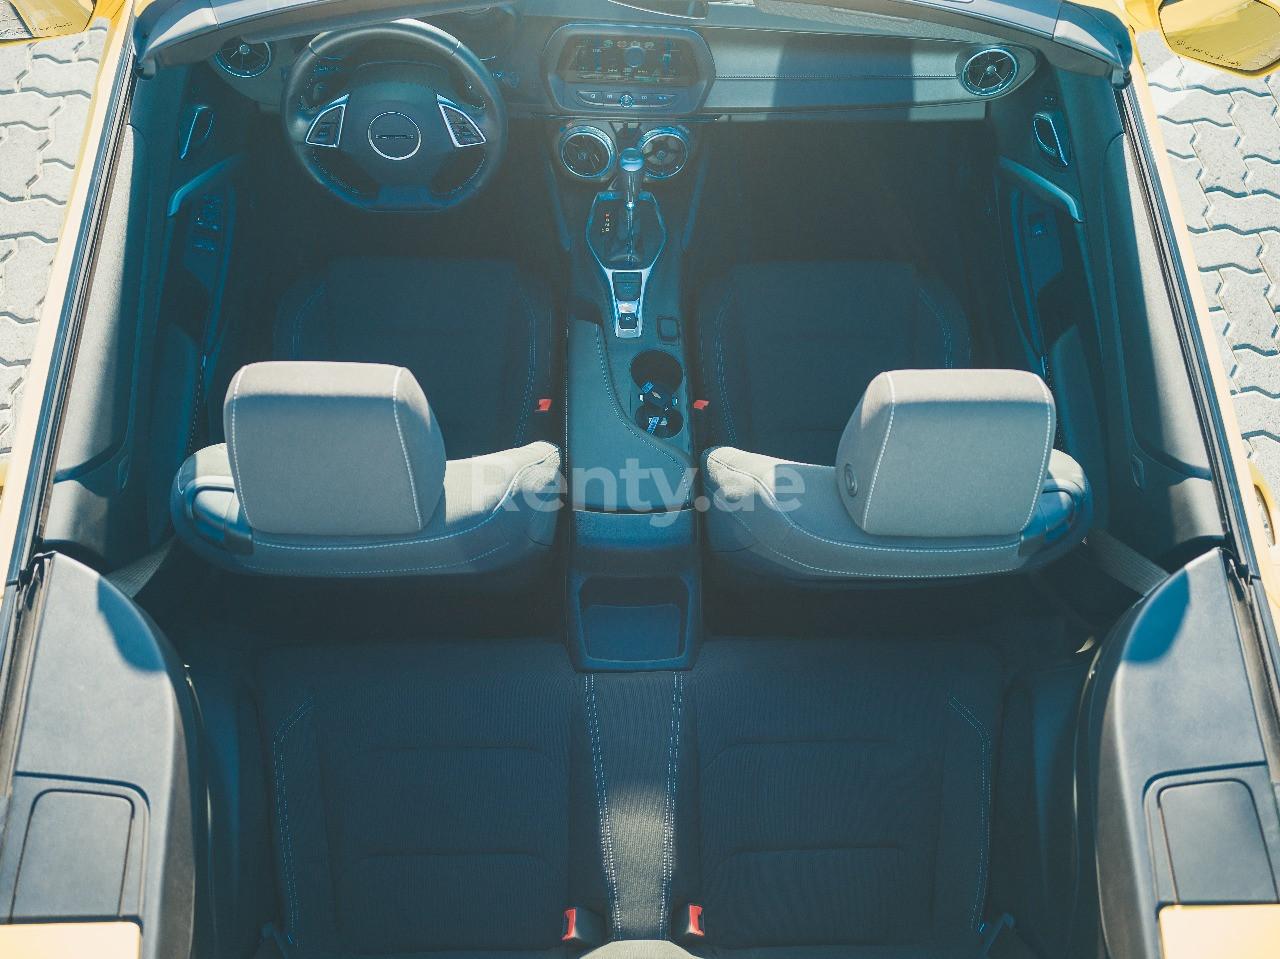 Chevrolet Camaro for rent in Dubai at Renty - photo 8